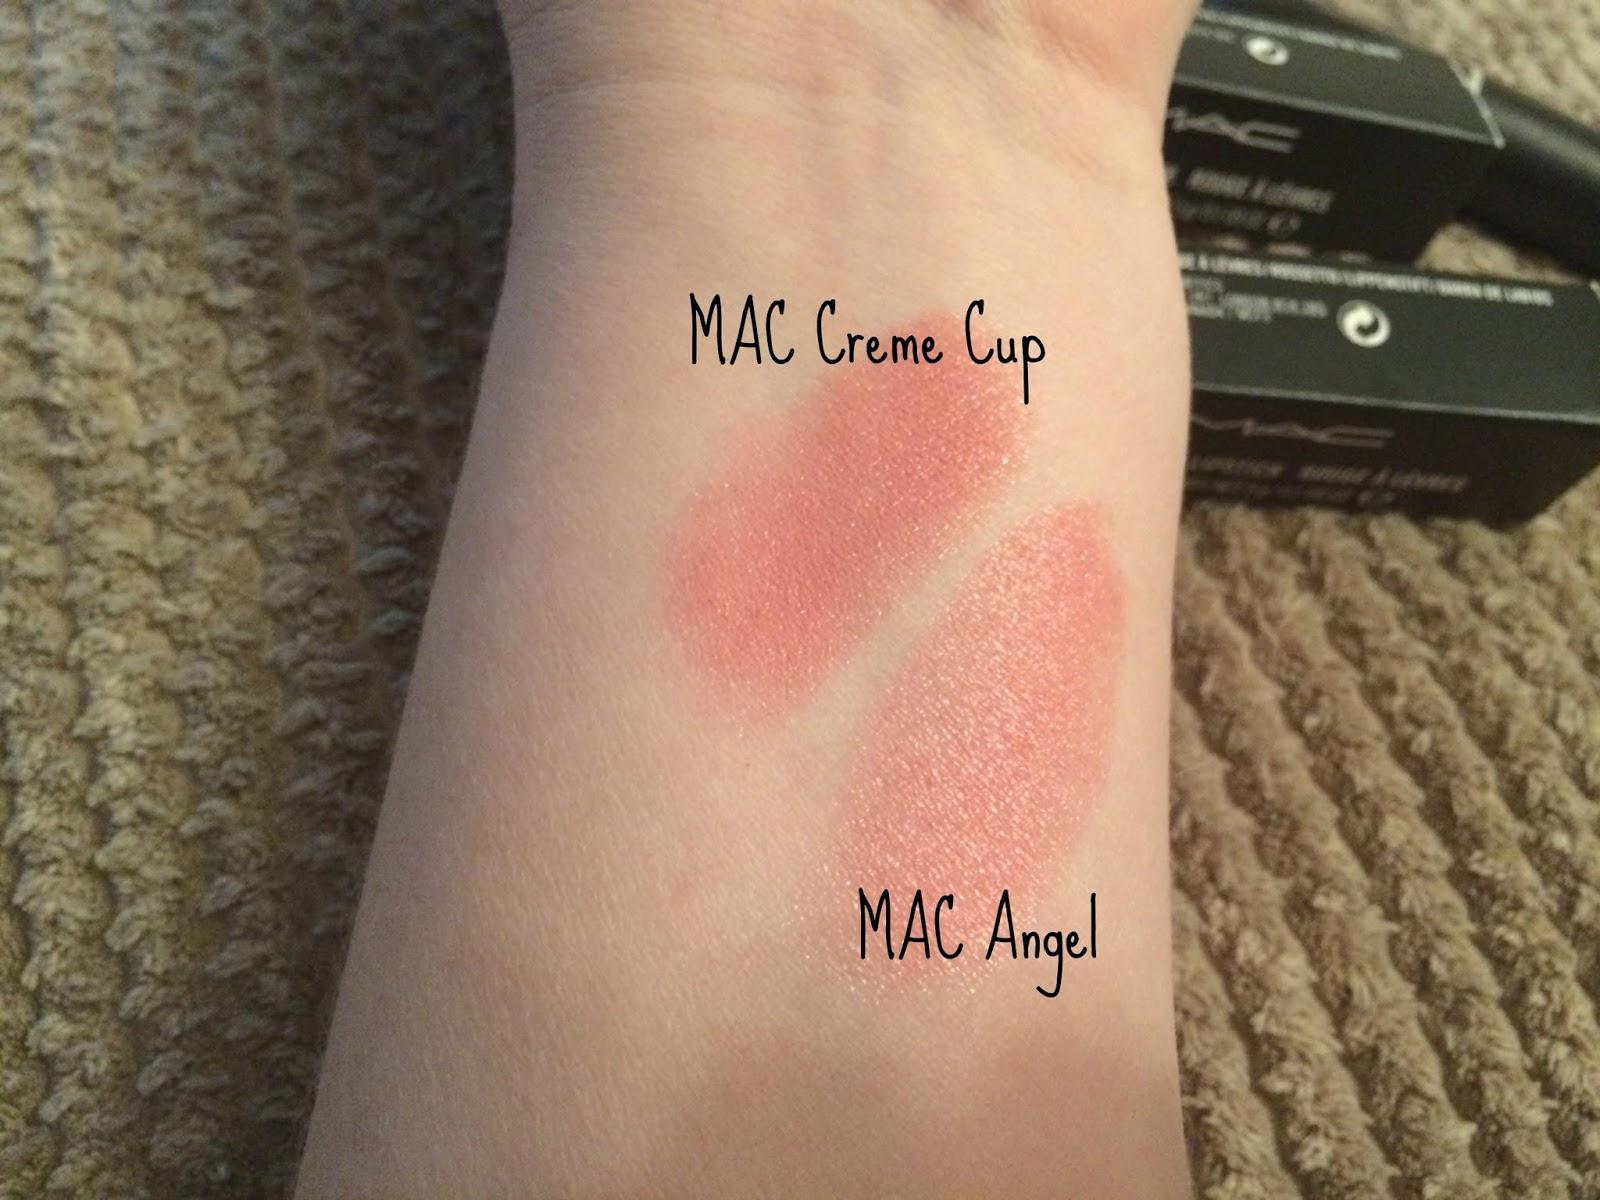 mac creme cup vs angel - photo #13